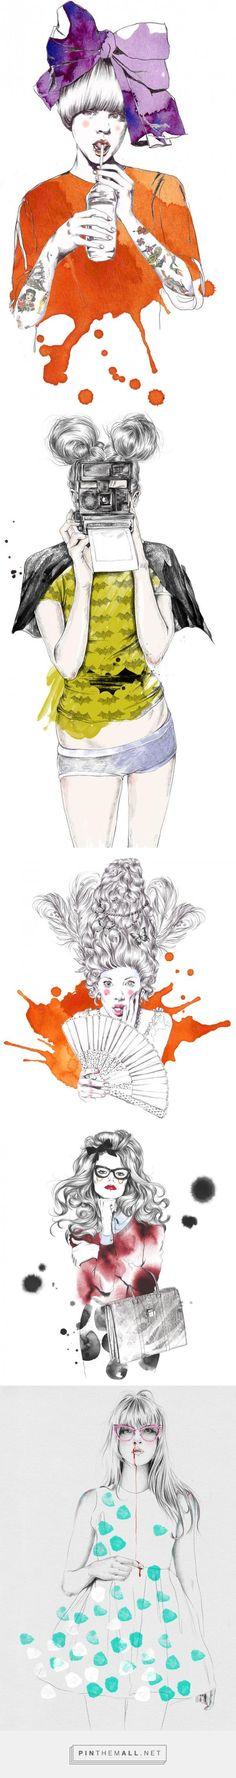 Fashion Illustrations by Esra Roise